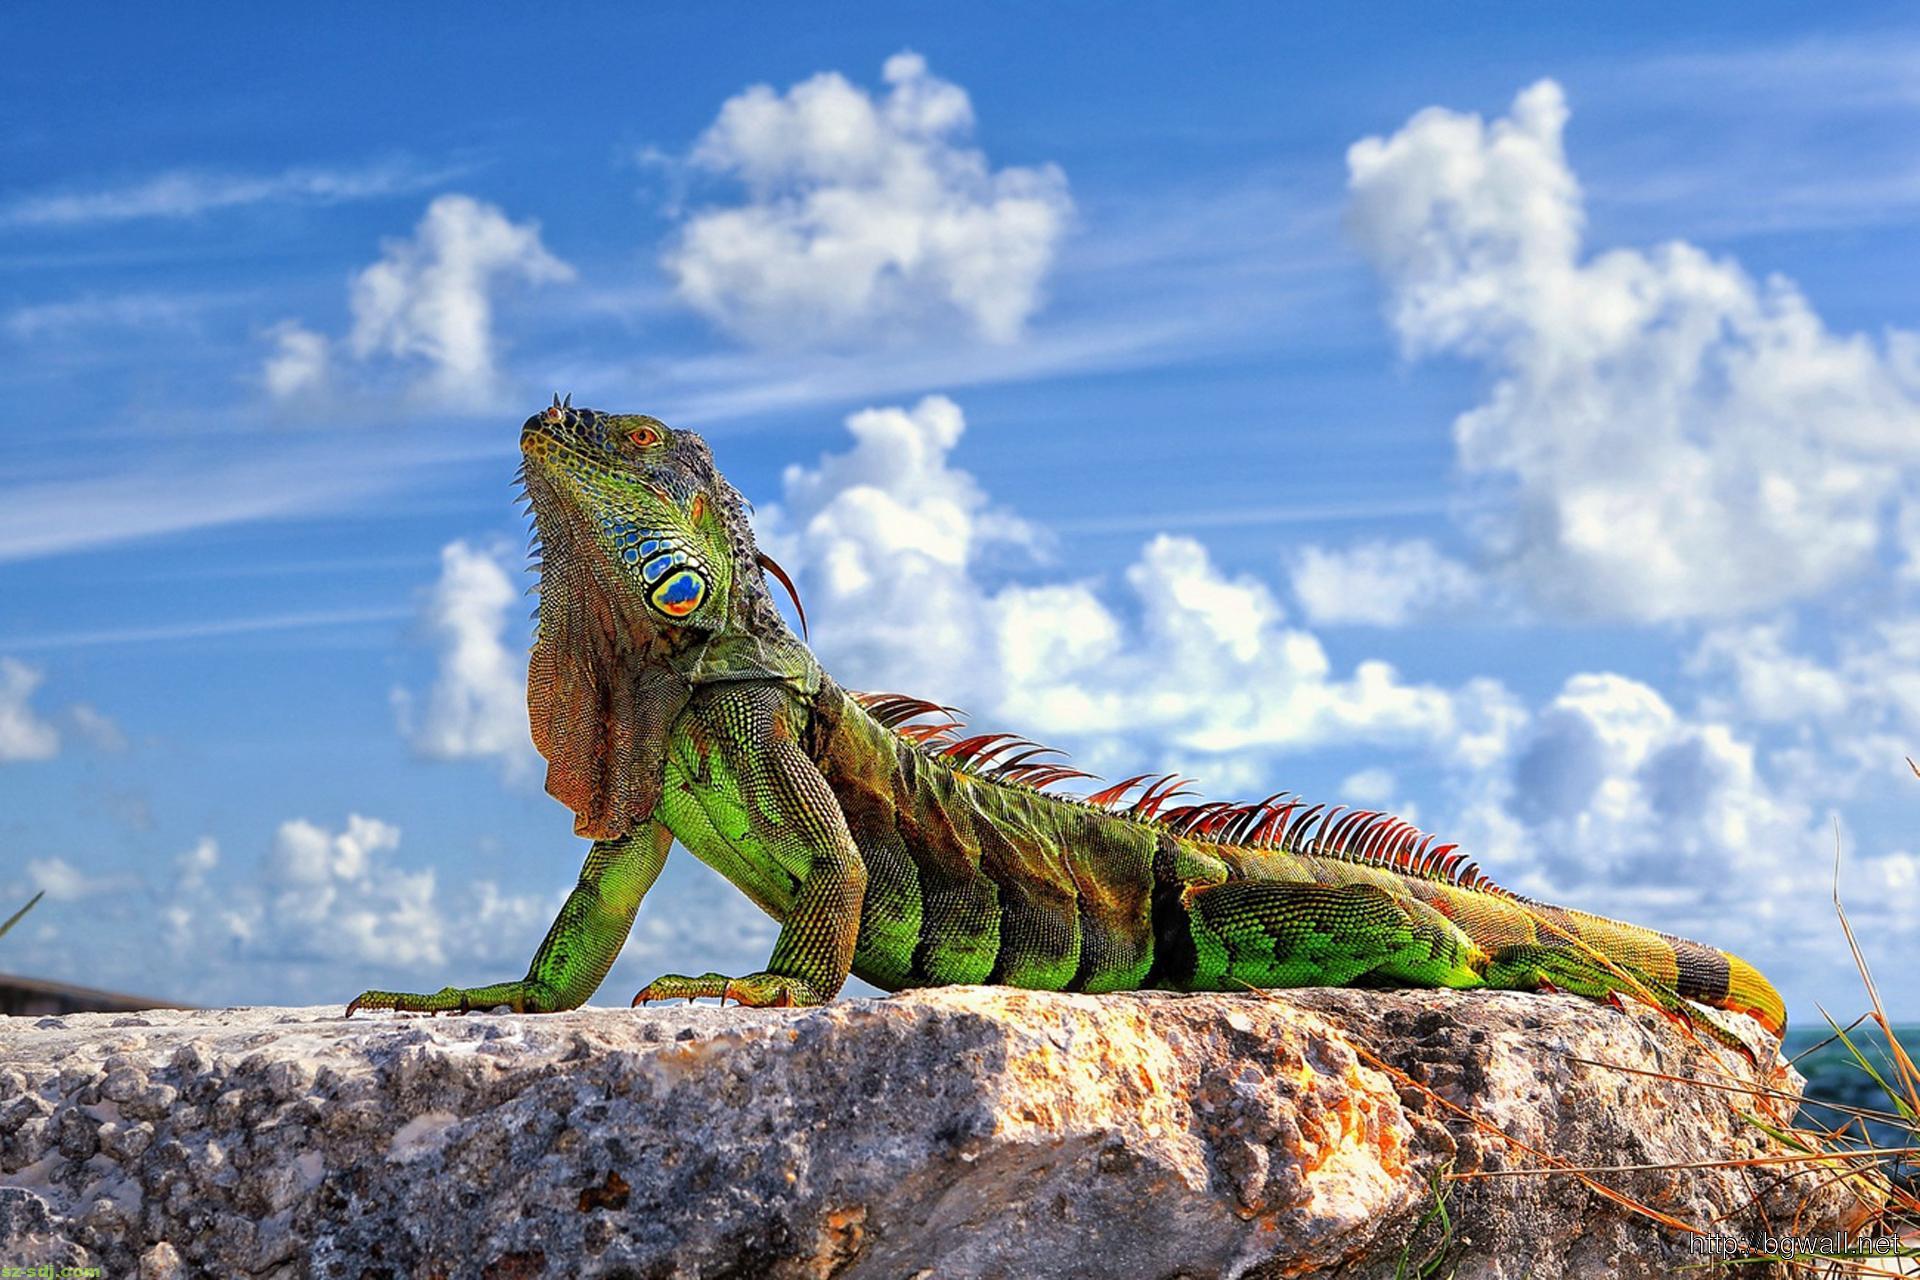 an-iguana-standing-on-the-rock-wallpaper-landscape